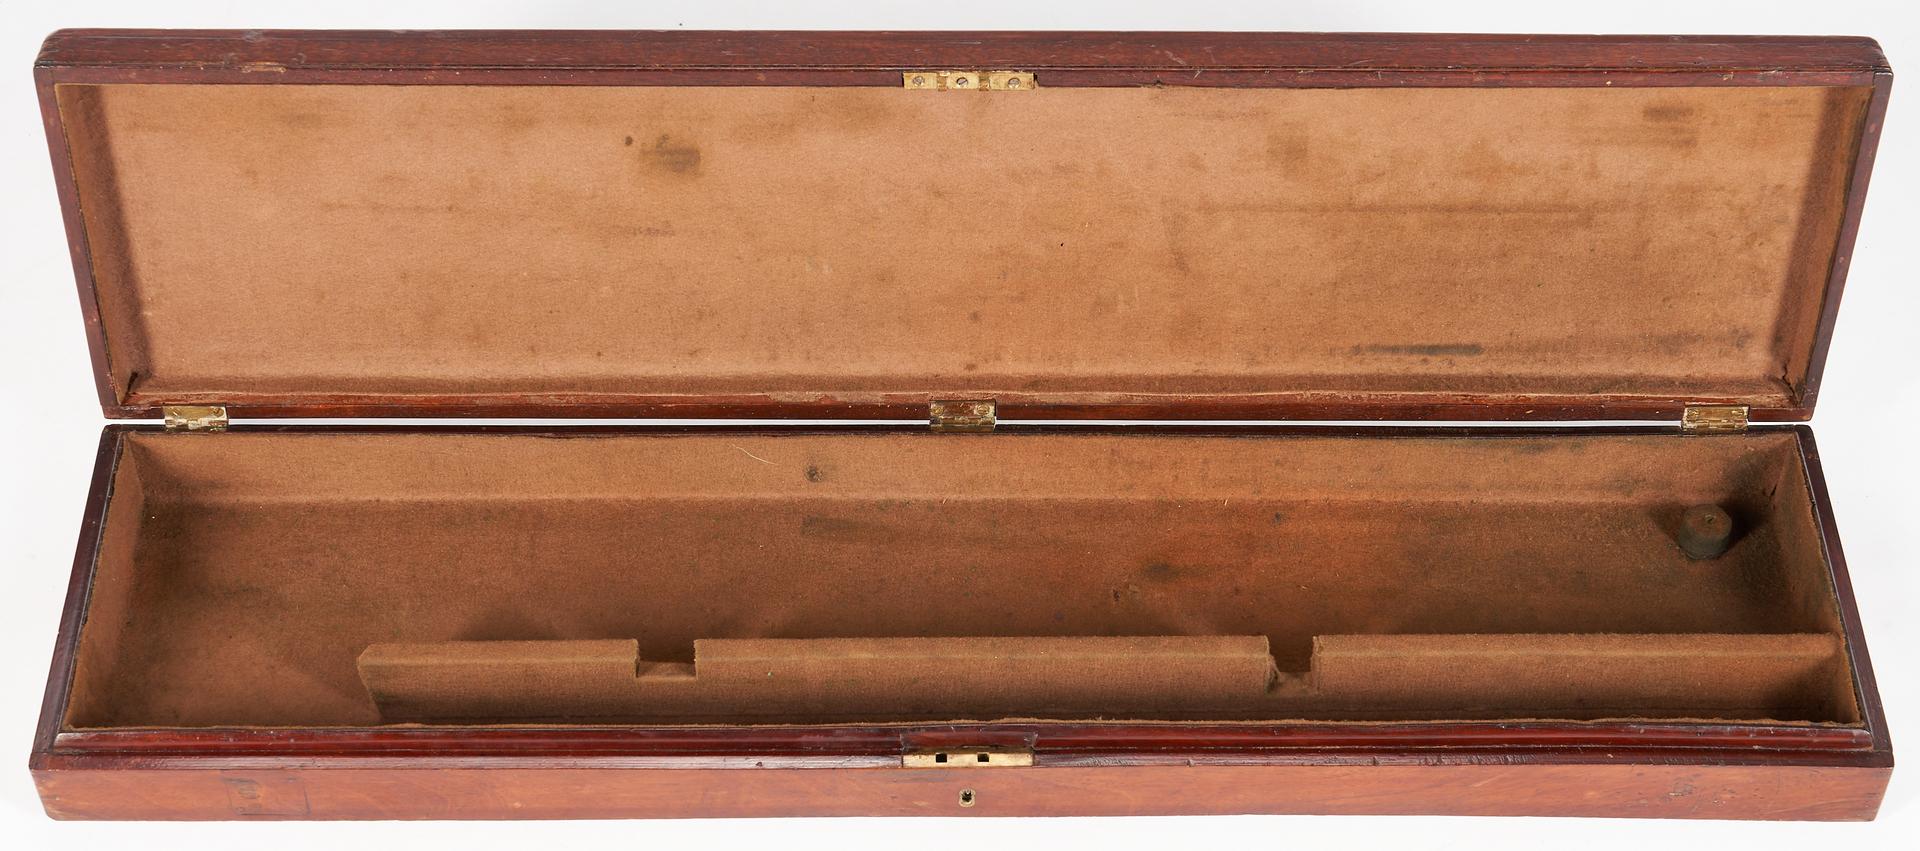 Lot 450: Mahogany Gun Case on Stand